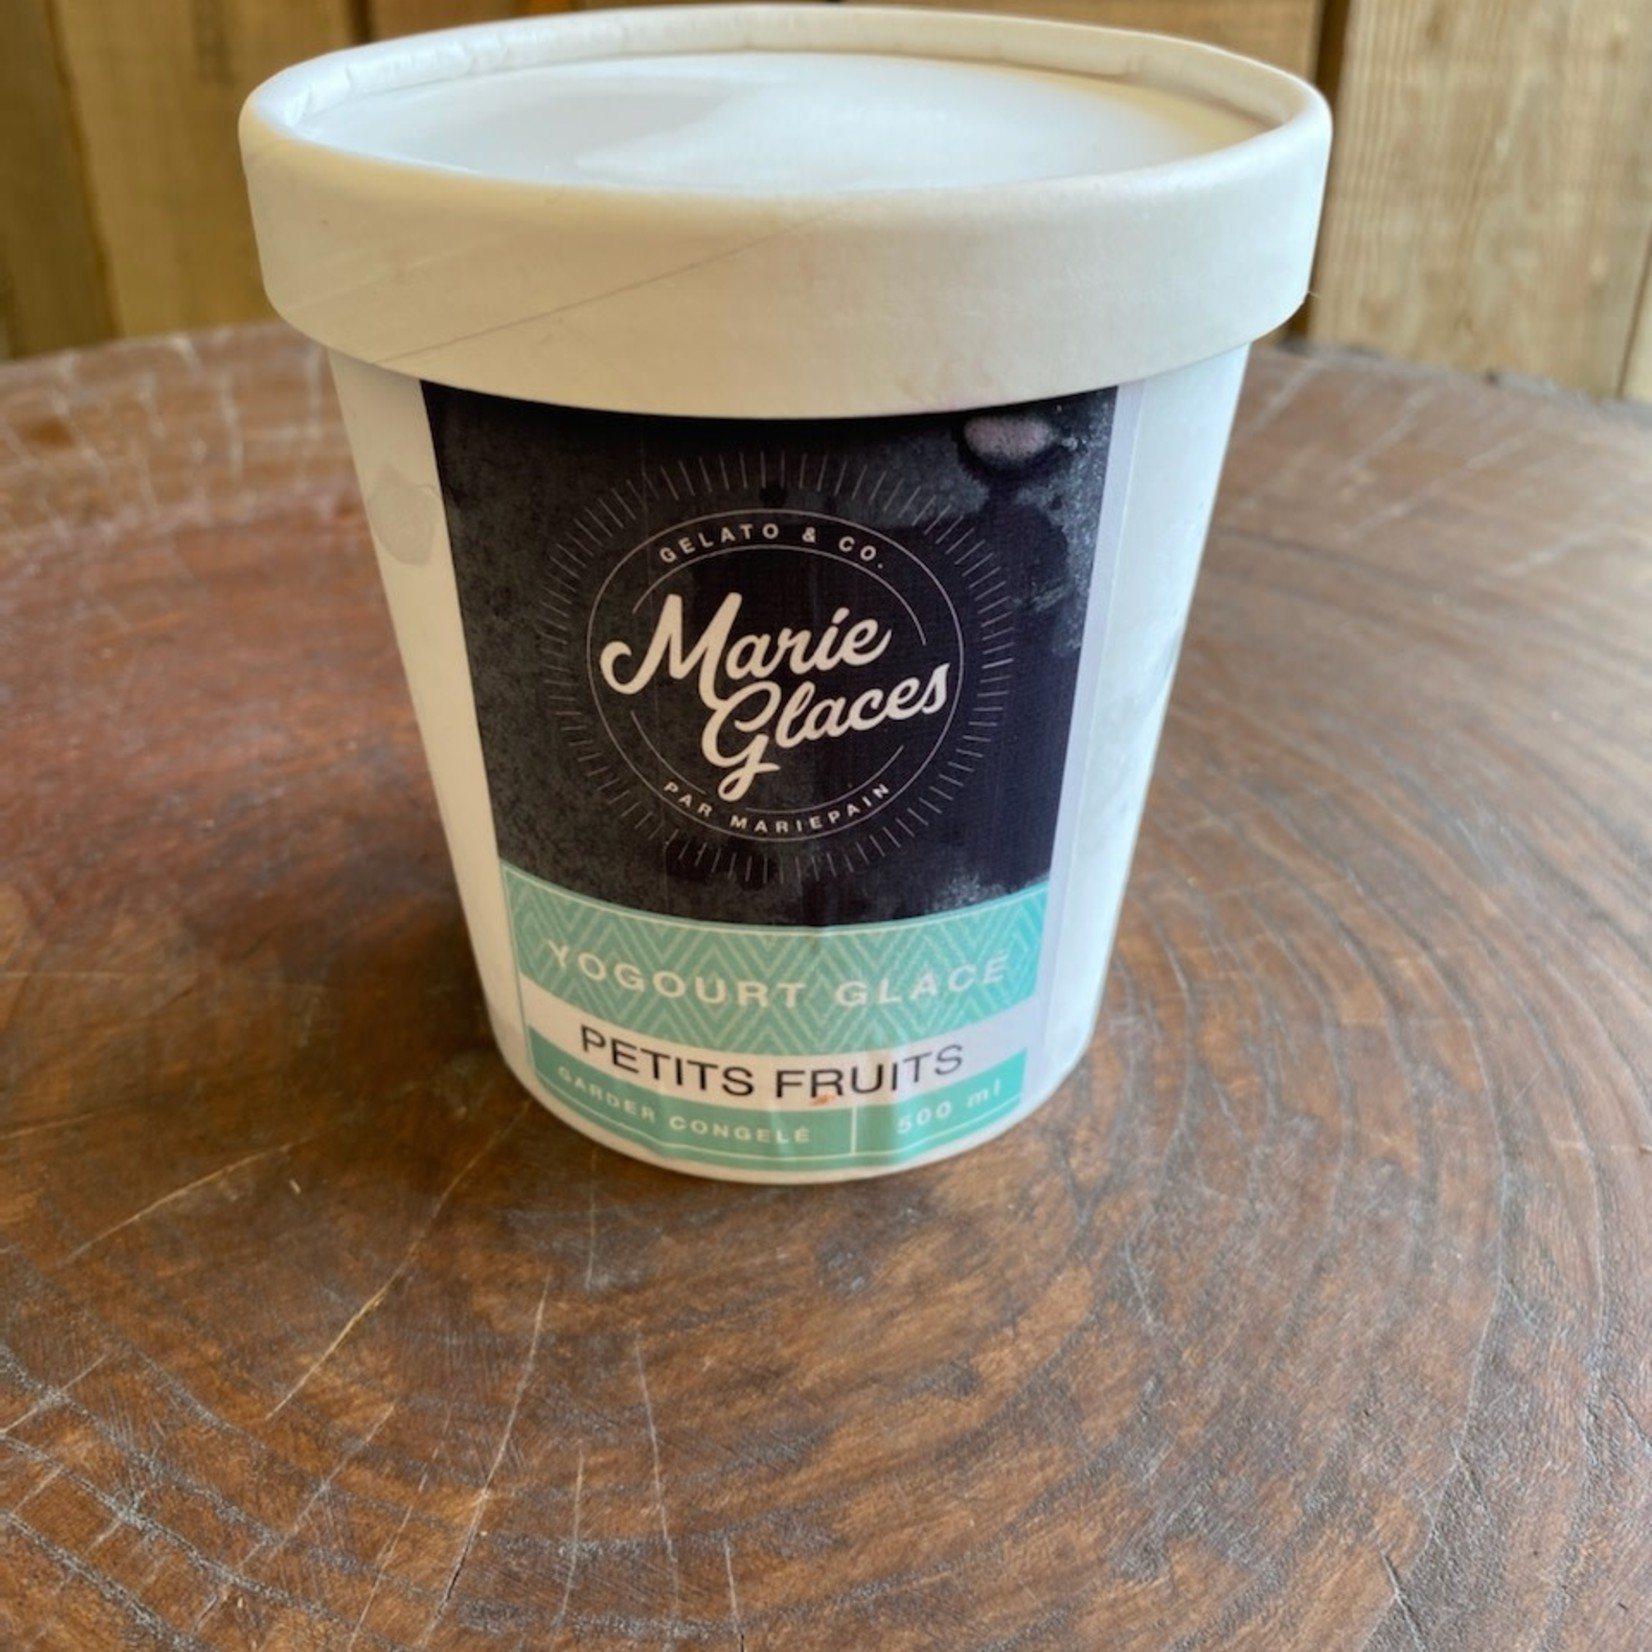 Yogourt glacé - Petits fruits (500ml)